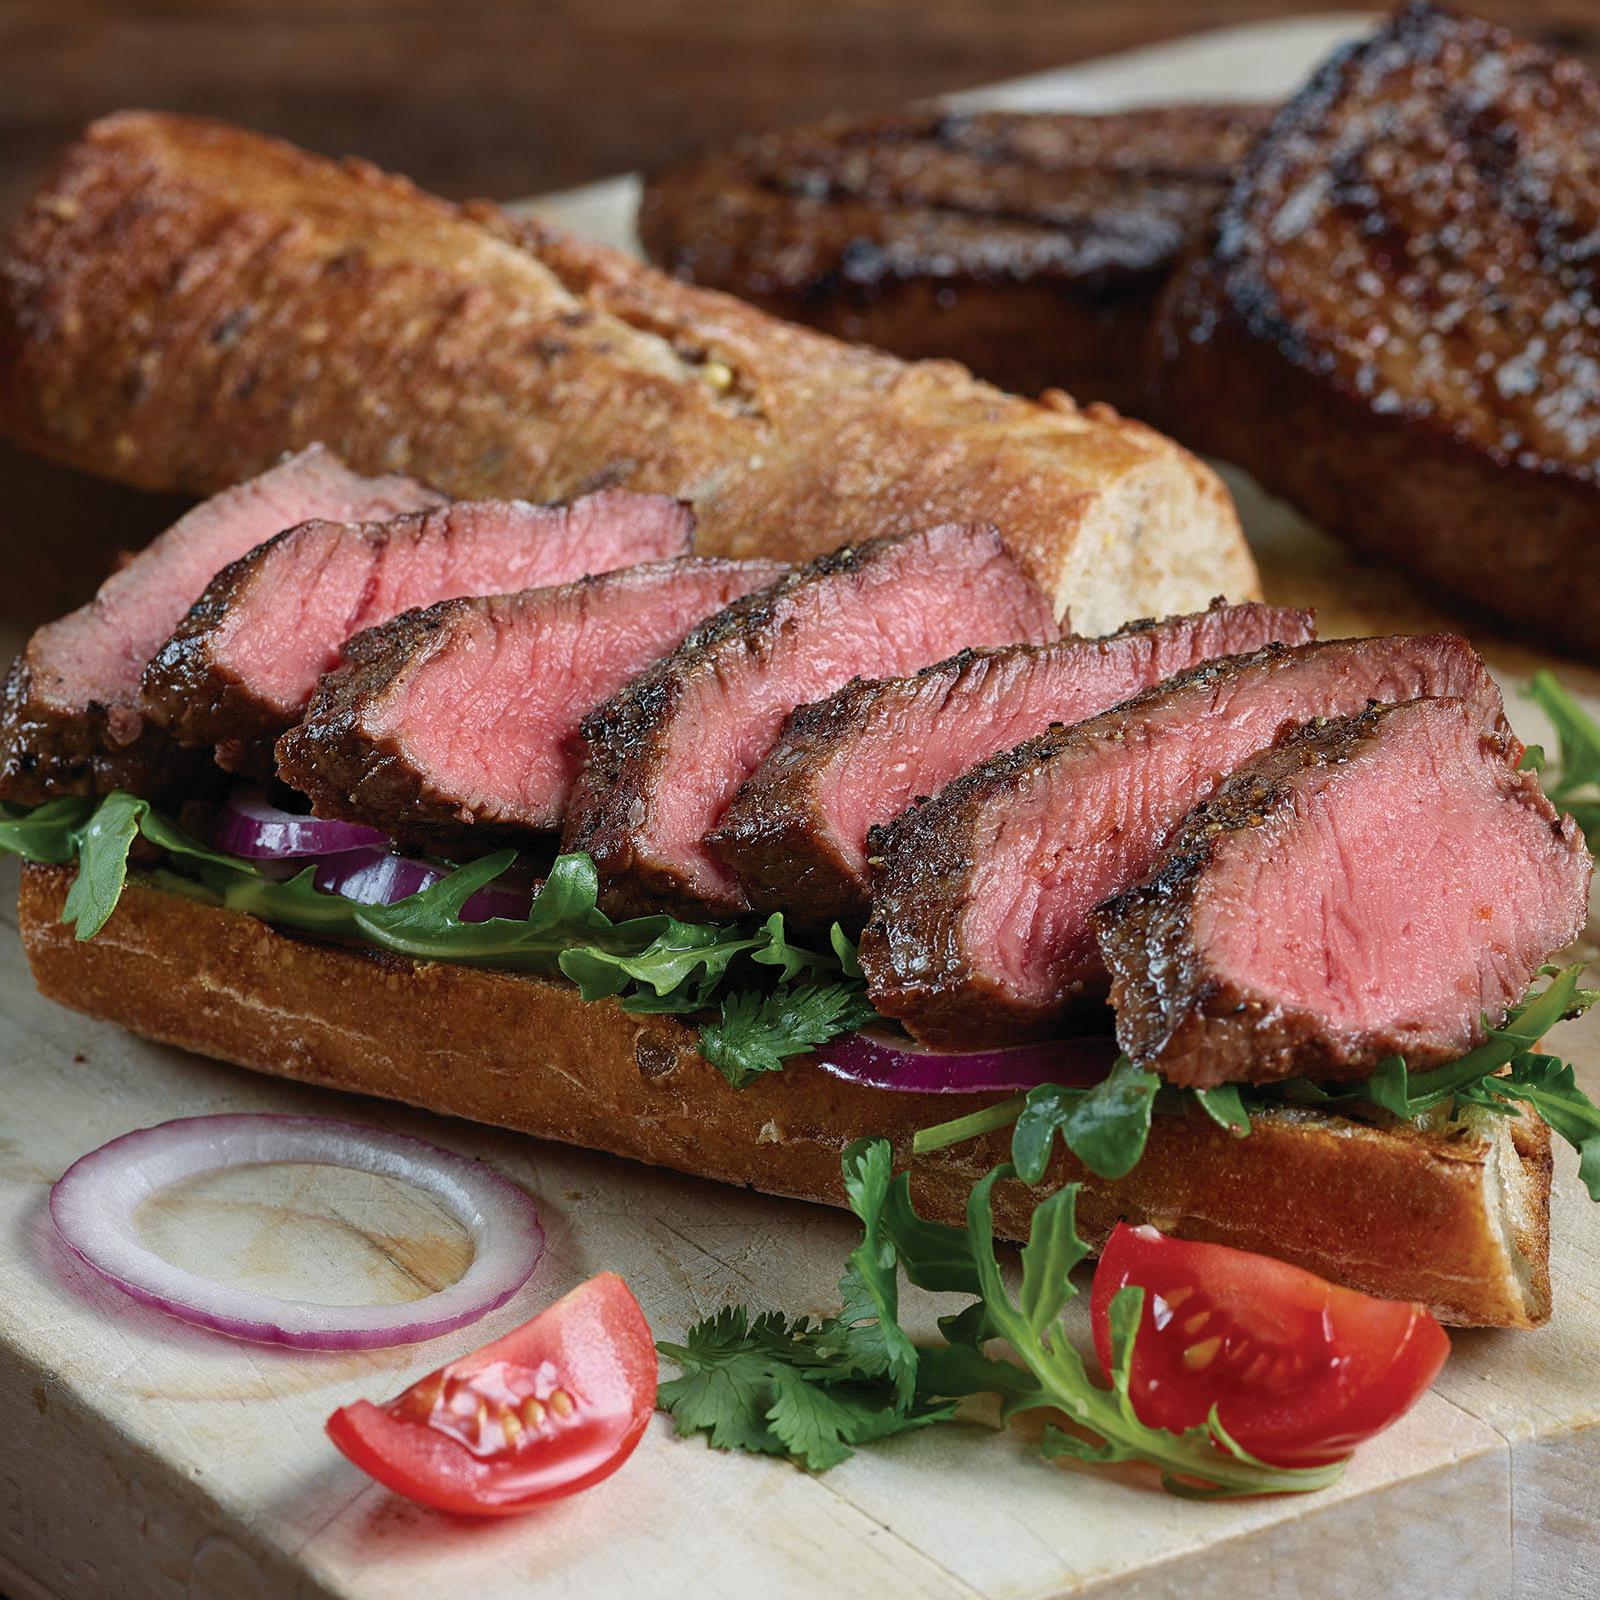 10 Best Steak Sandwich Recipes